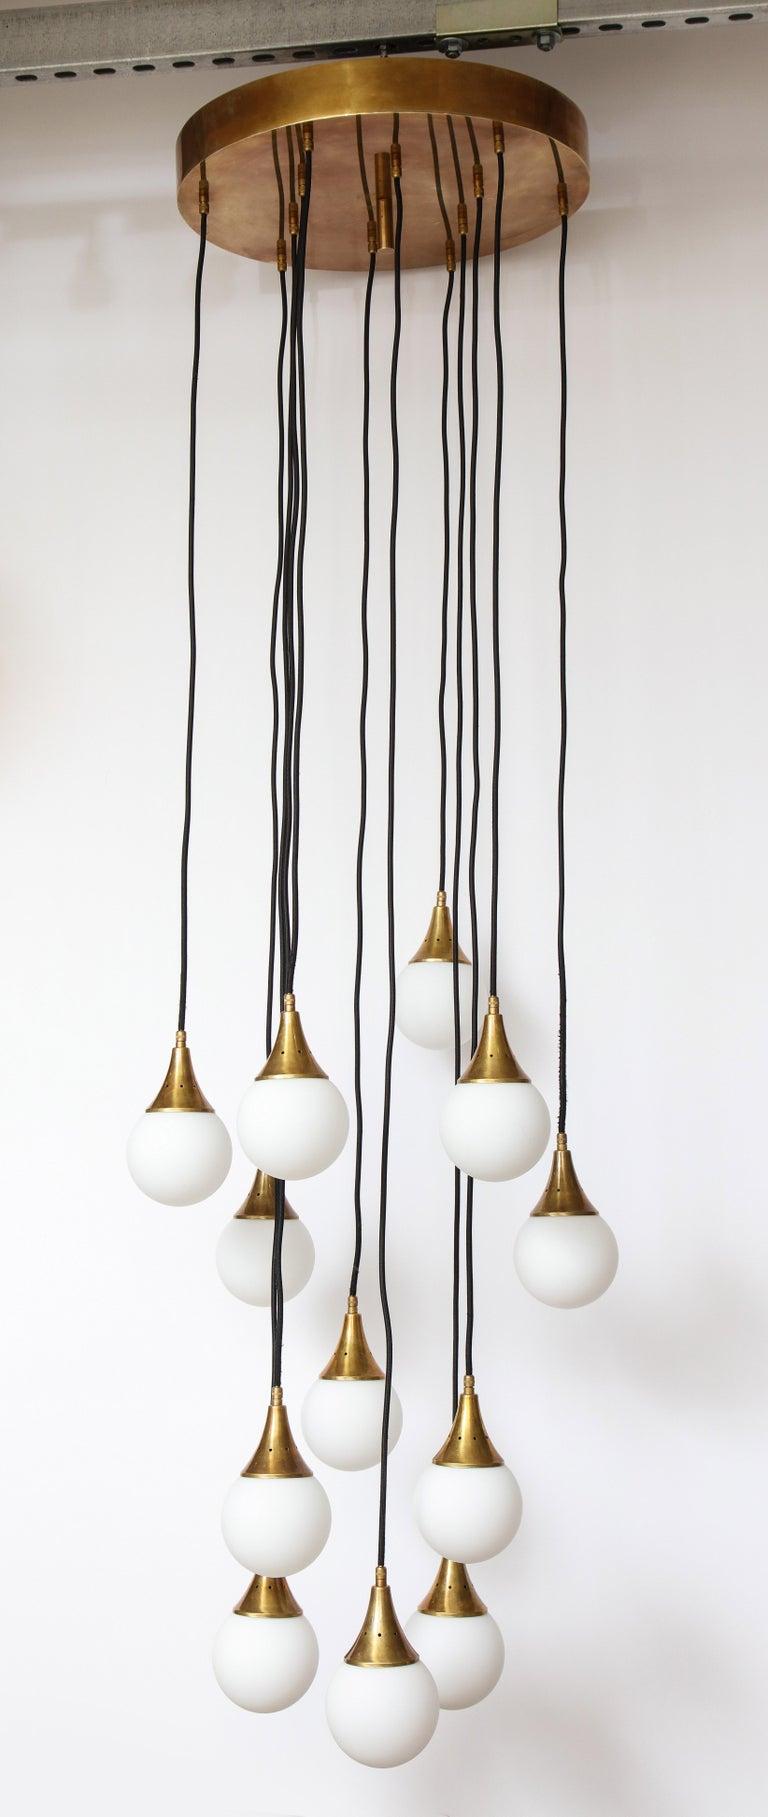 Stilnovo Cascading Chandelier with Twelve Opaline Glass Lights For Sale 5